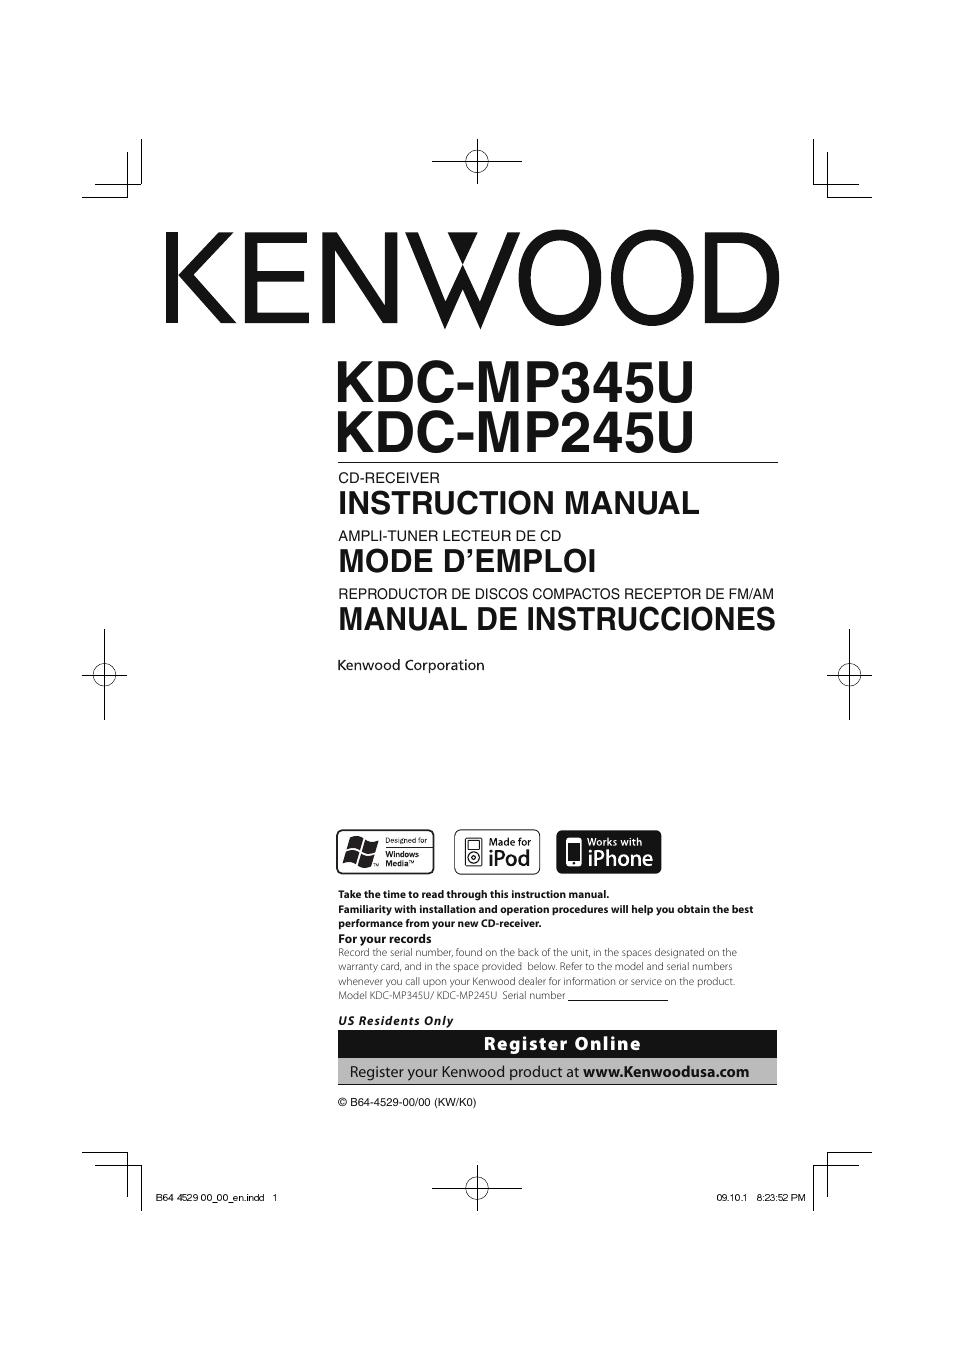 Diagrams 419300 kenwood kdc mp345u wiring diagram kenwood kdc Kenwood Kdc-252U Wiring Diagram Kenwood KDC X794 Wiring-Diagram Kenwood KDC-MP345U Wiring-Diagram Model